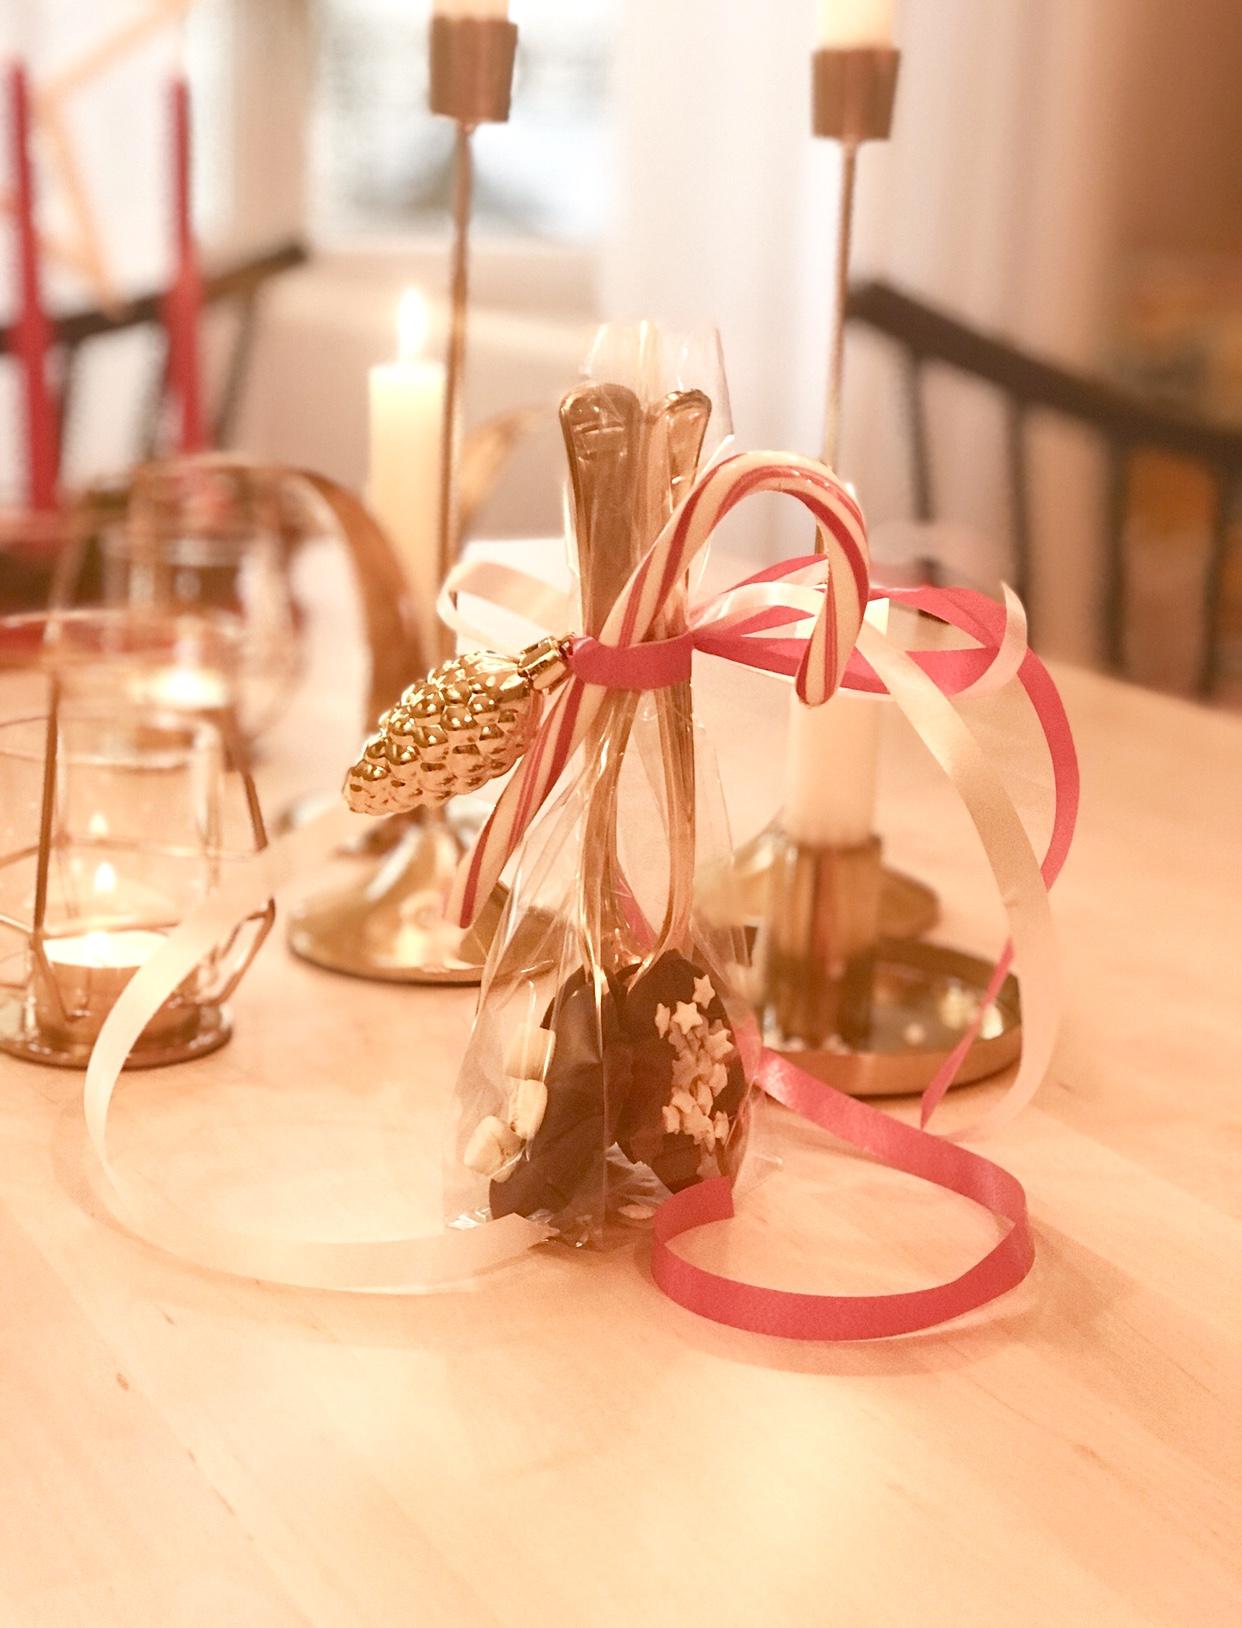 ge bort choklad i present